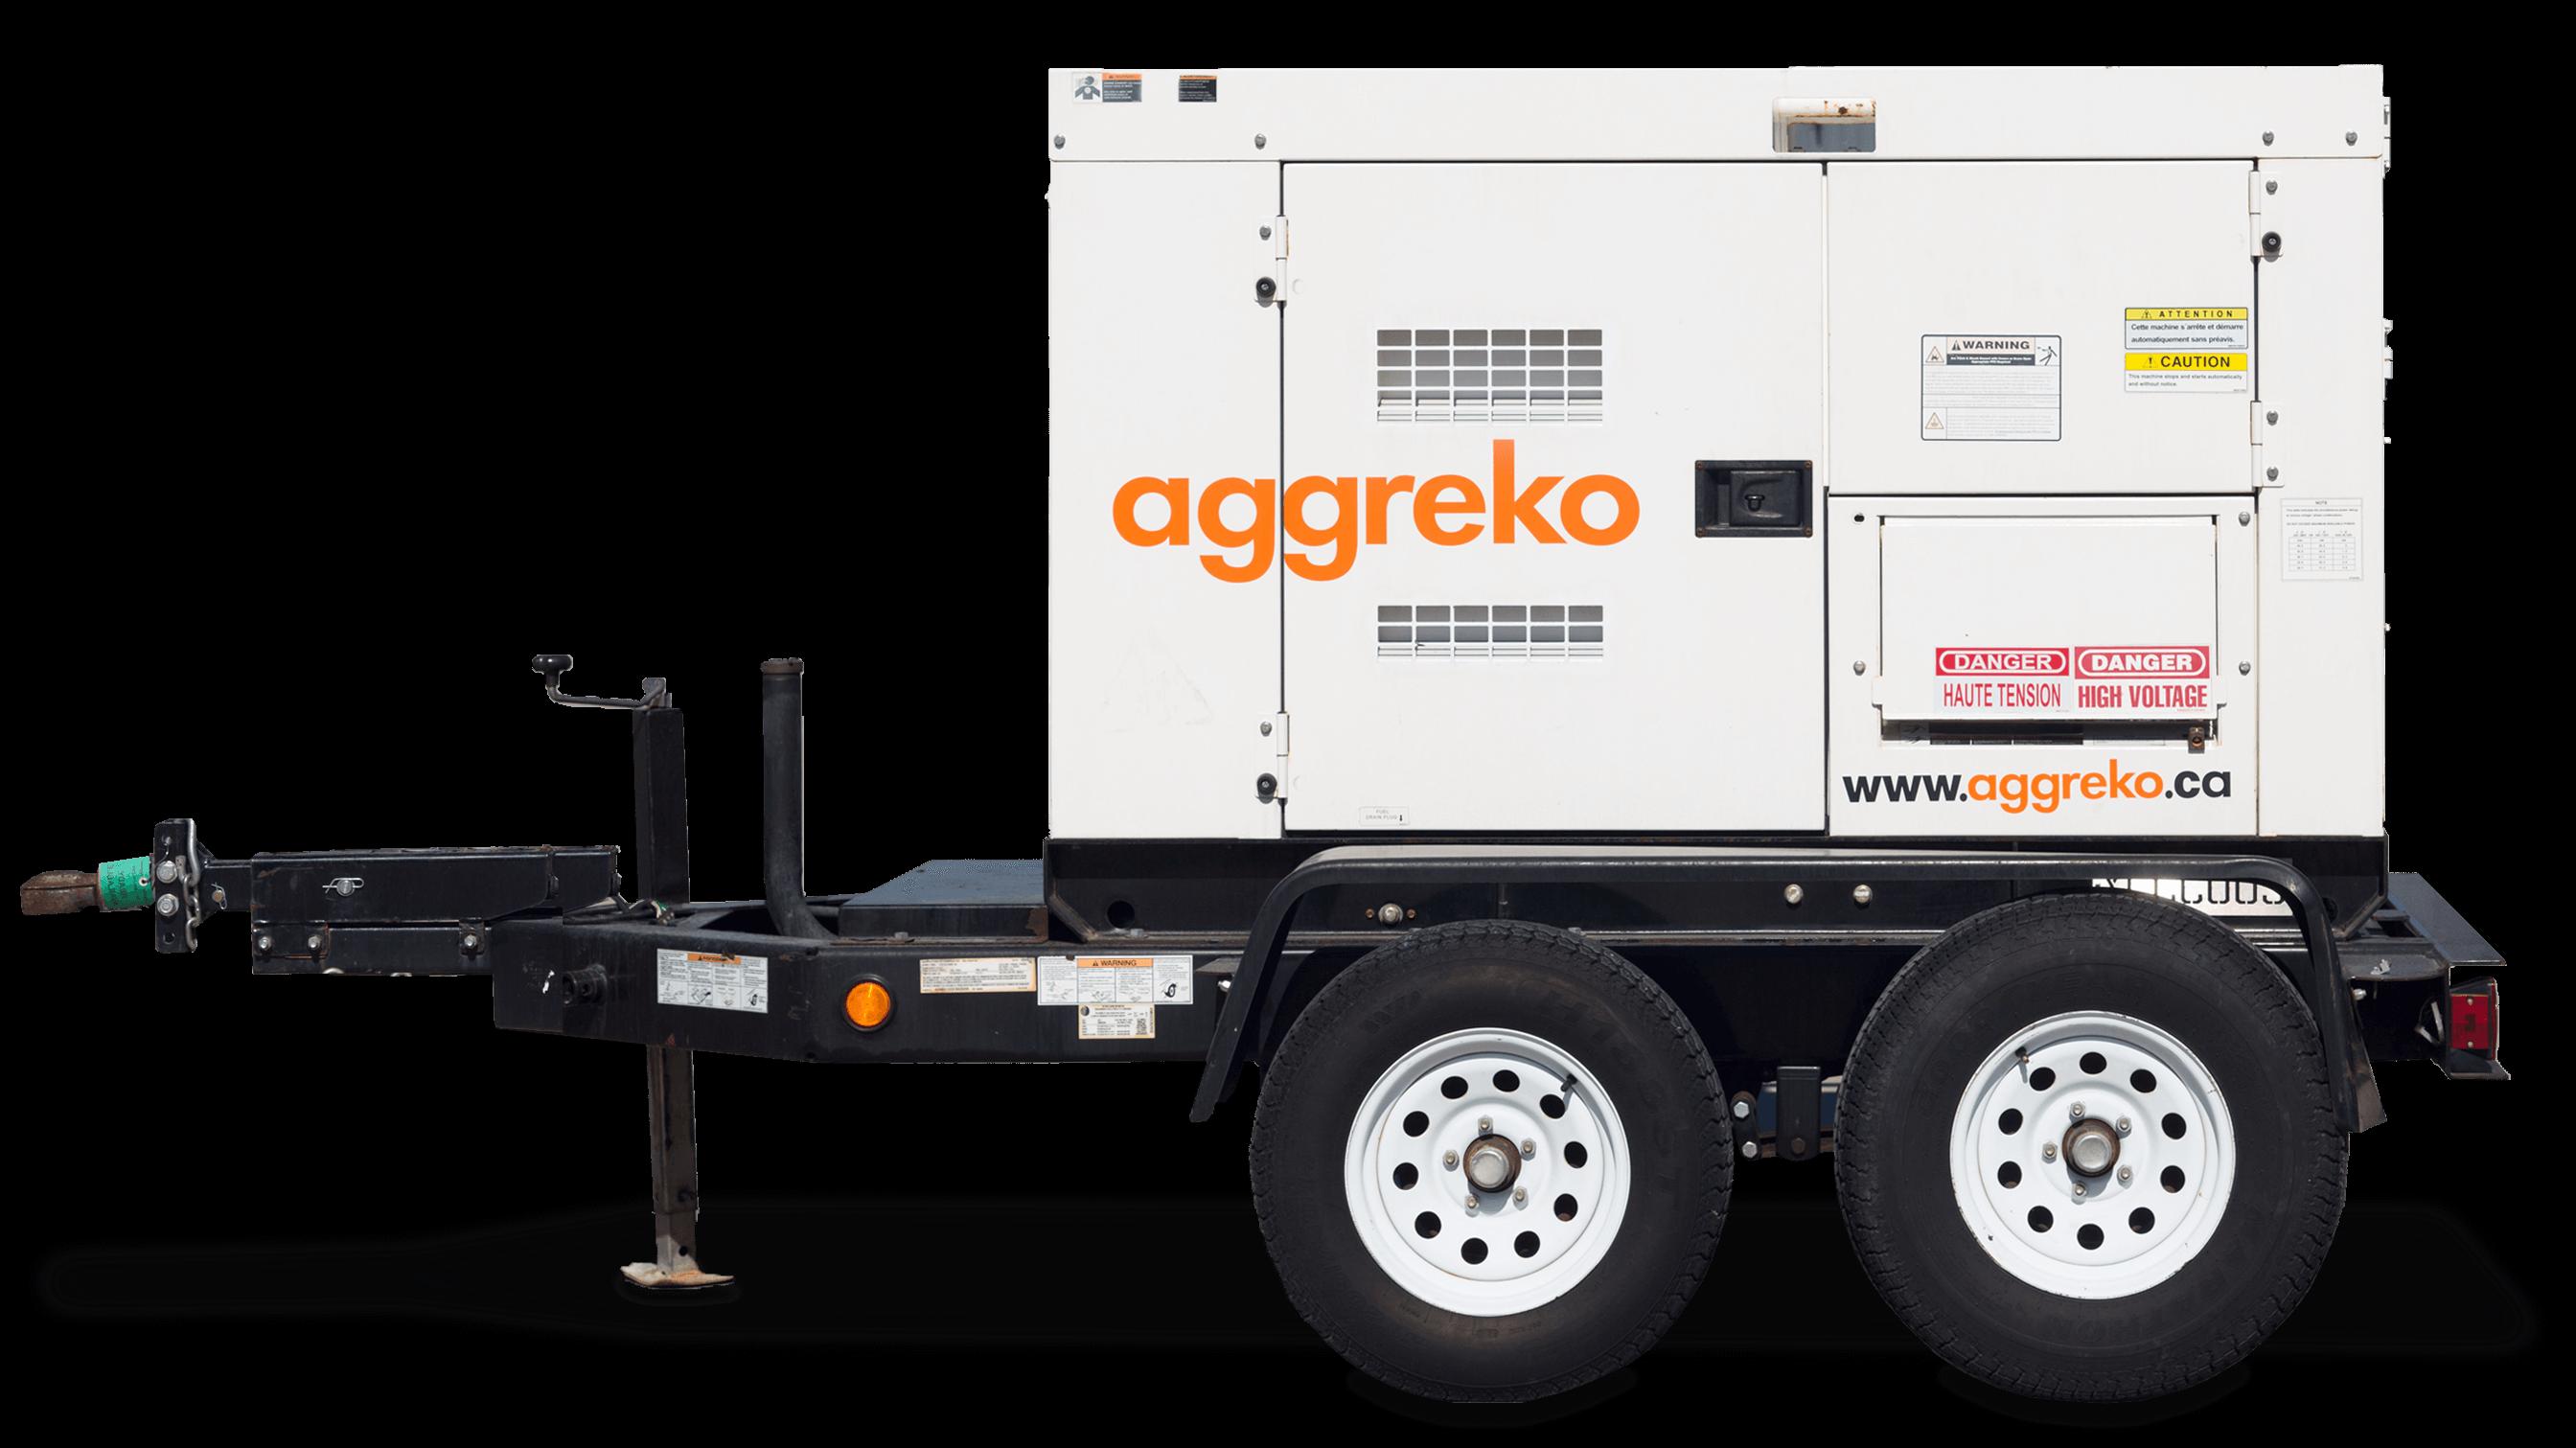 40 kW Diesel Generator Rentals | Portable, Trailer-mounted